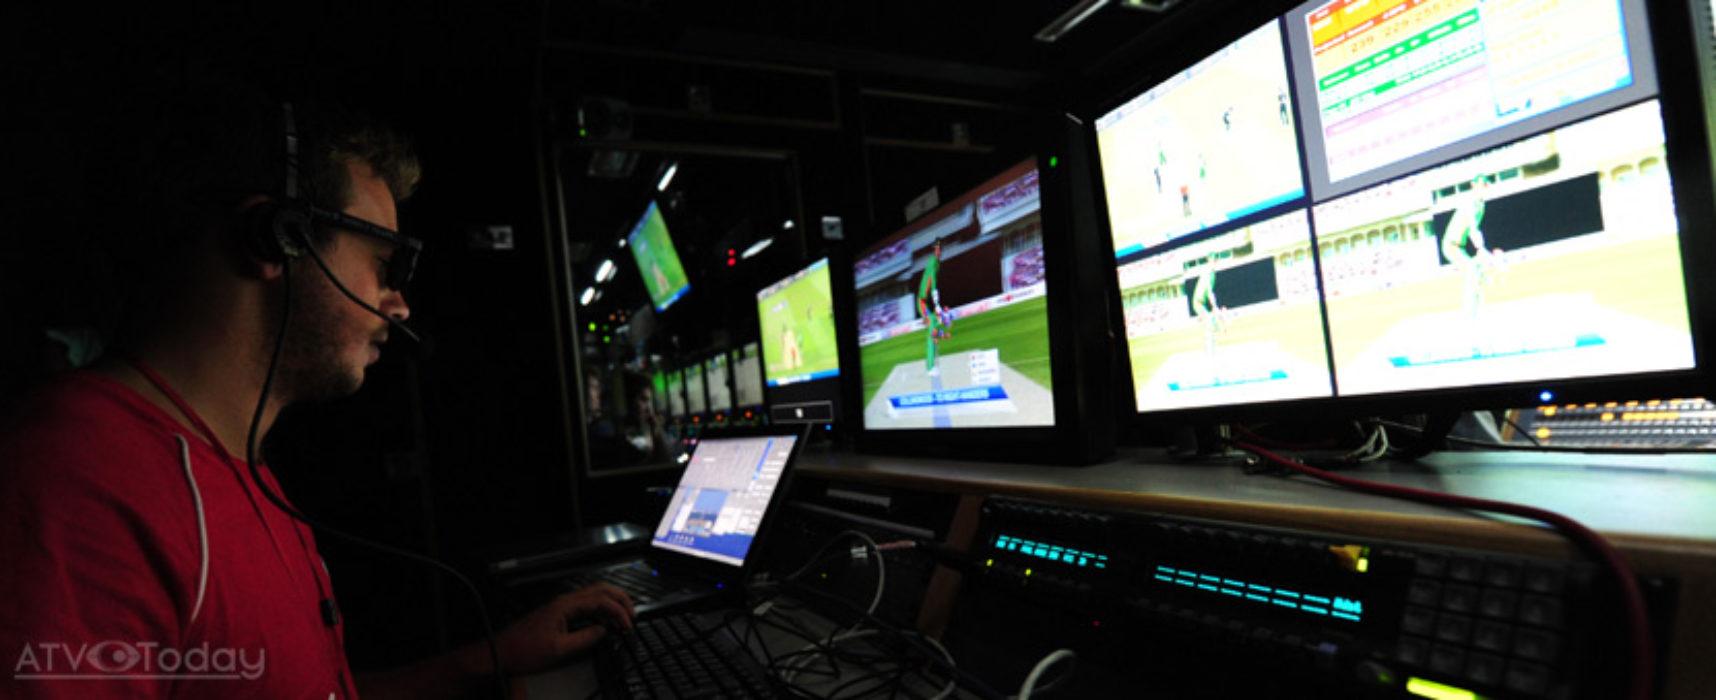 Live sports OTT the last saviour for sports broadcast?